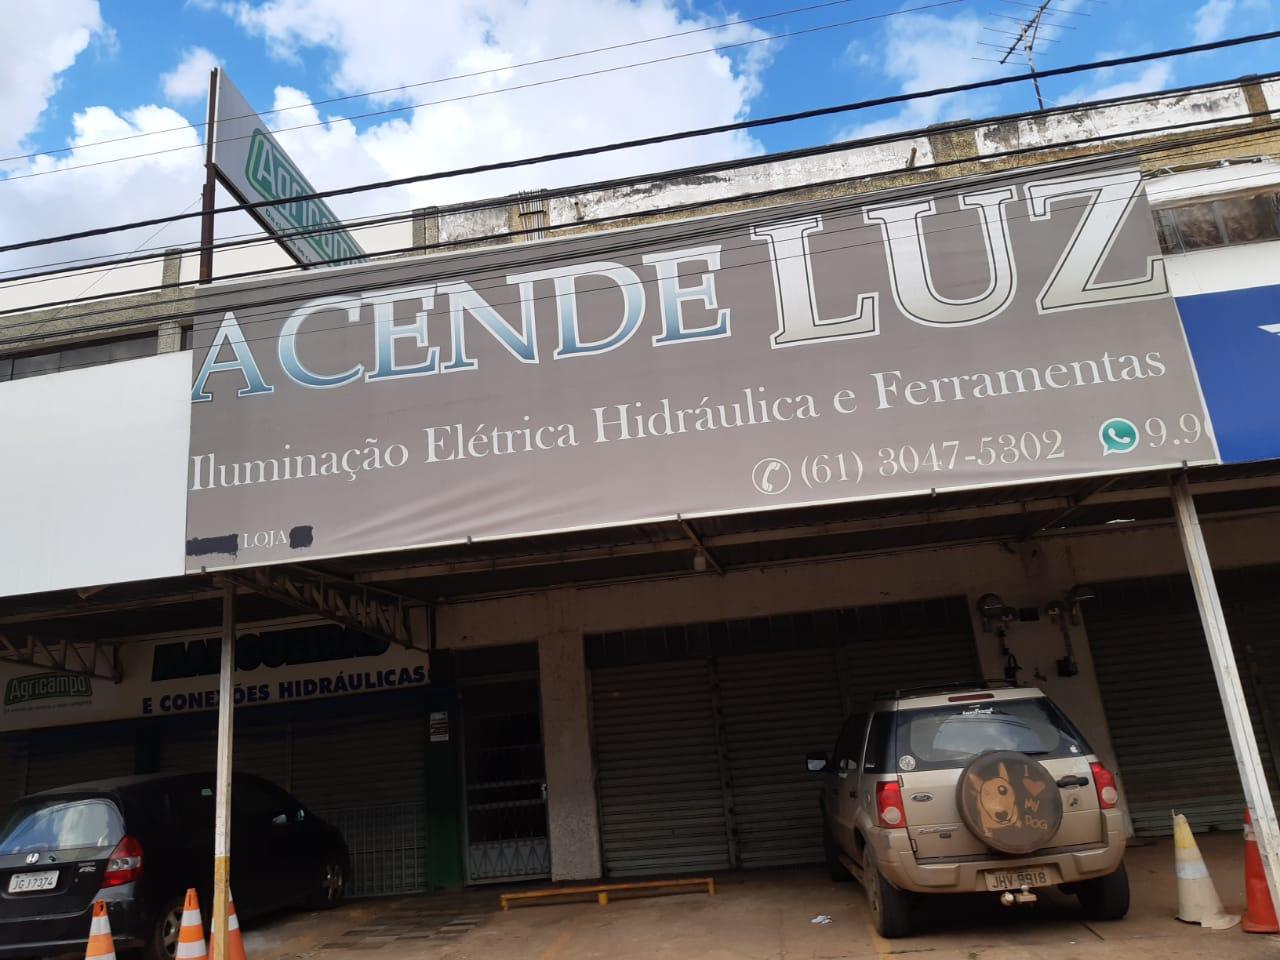 Acende Luz, SIA Trecho 5, Comercio Brasilia